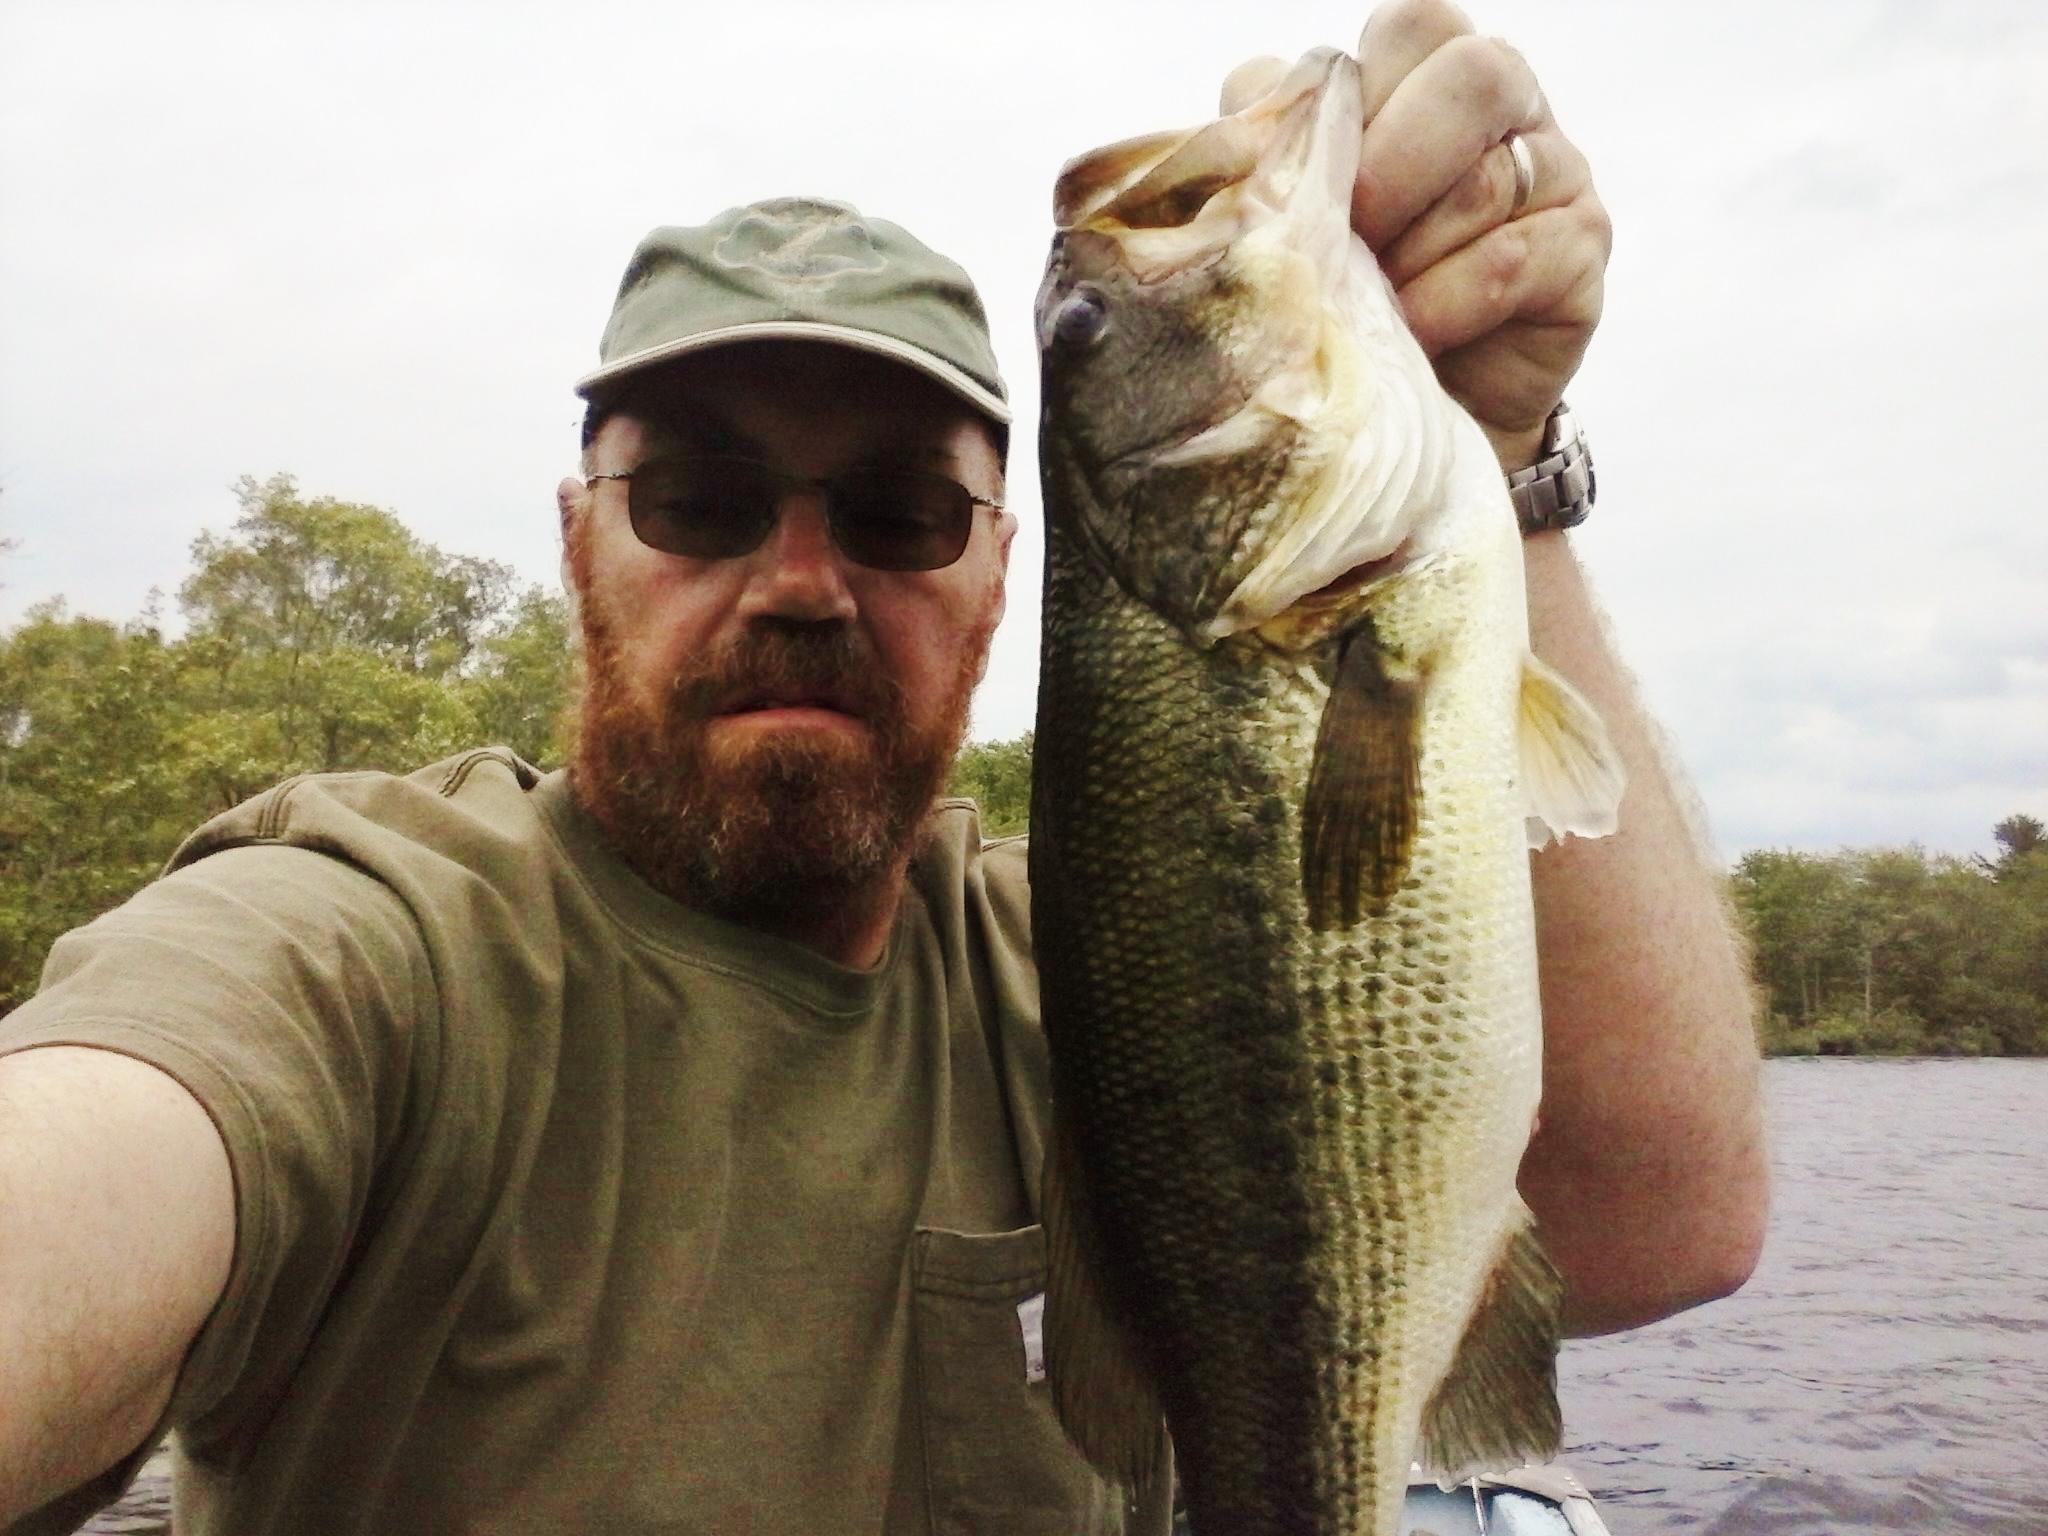 Sullivan county largemouth bass